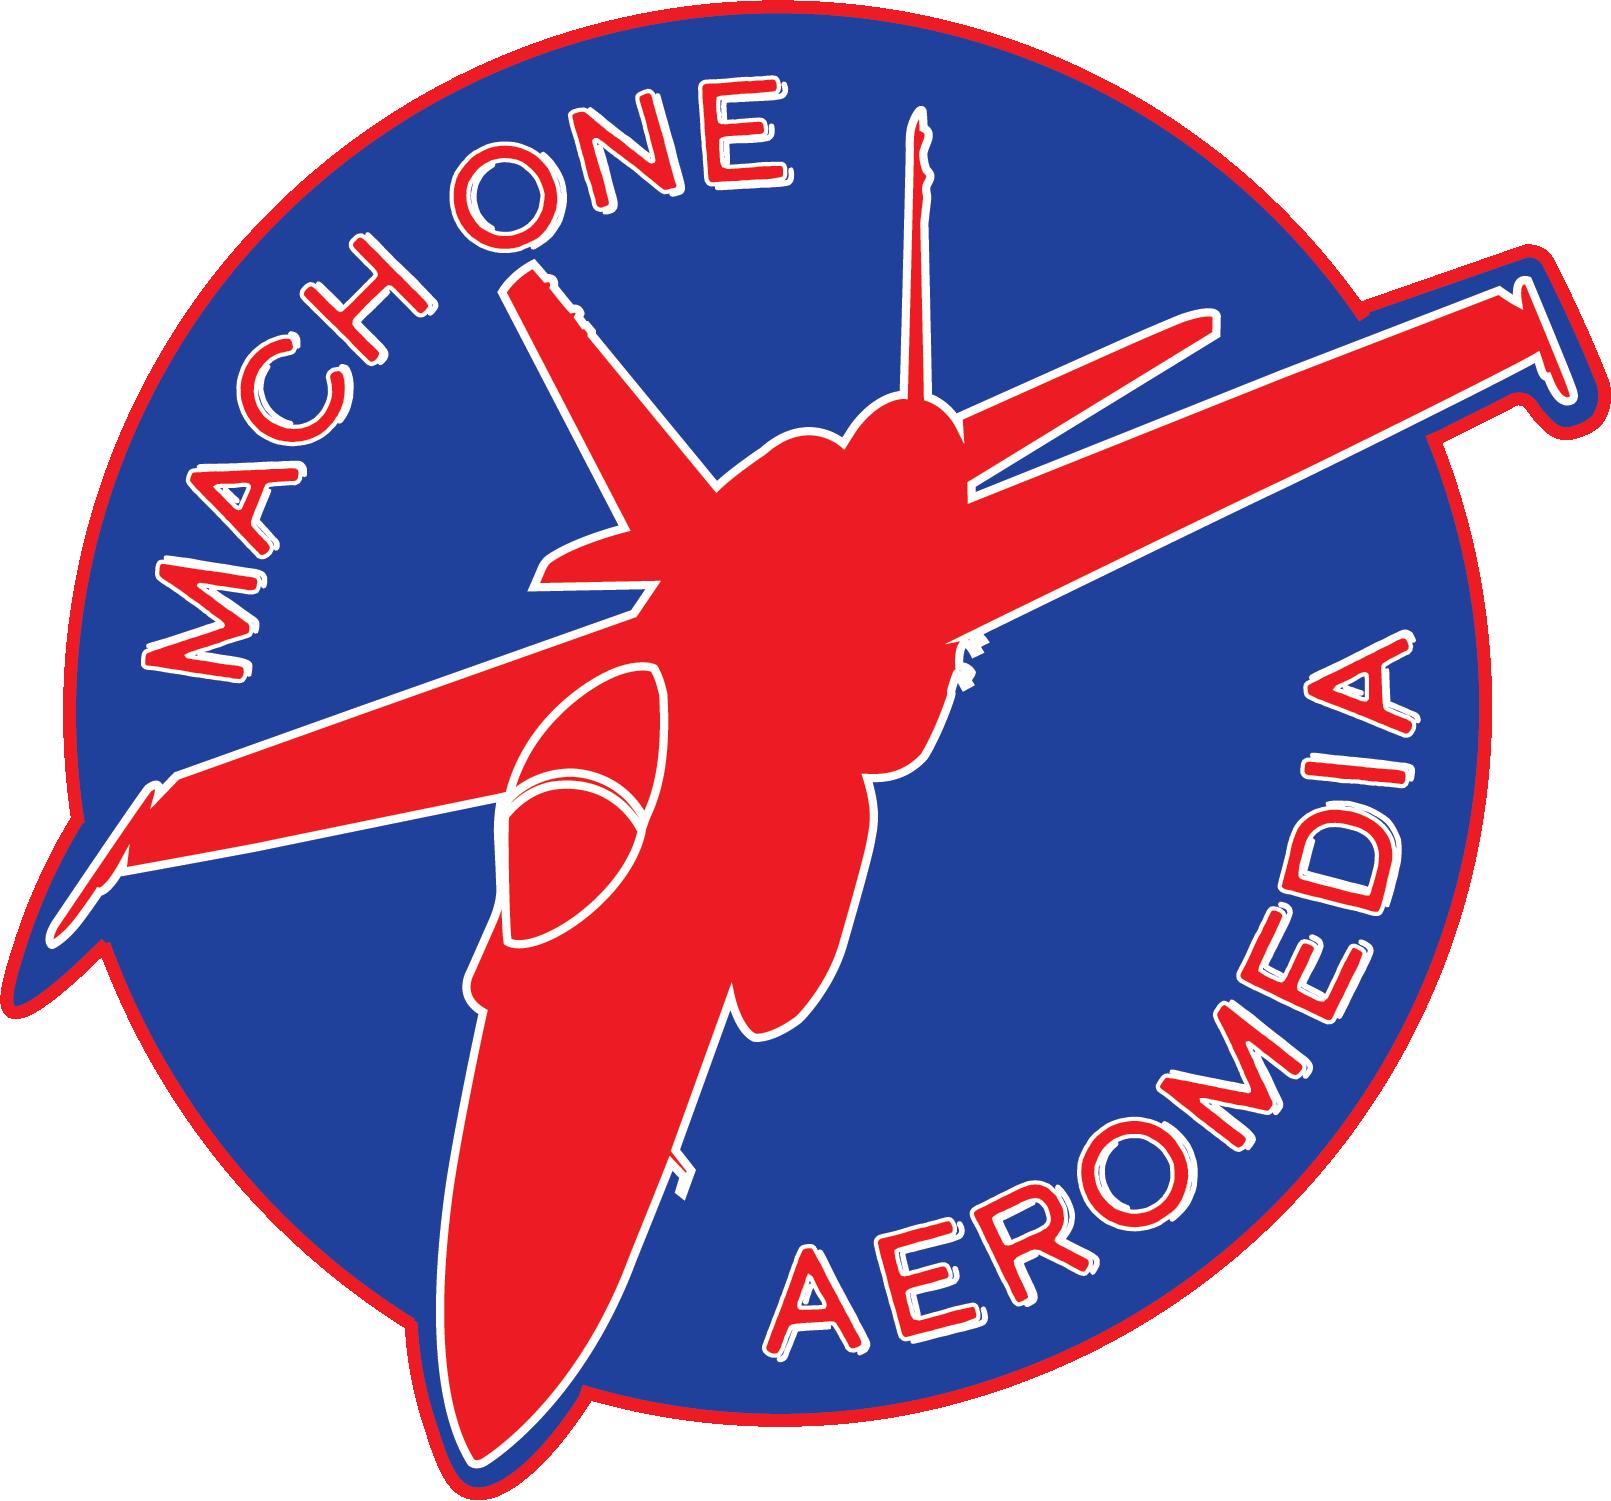 Mach One Aeromedia